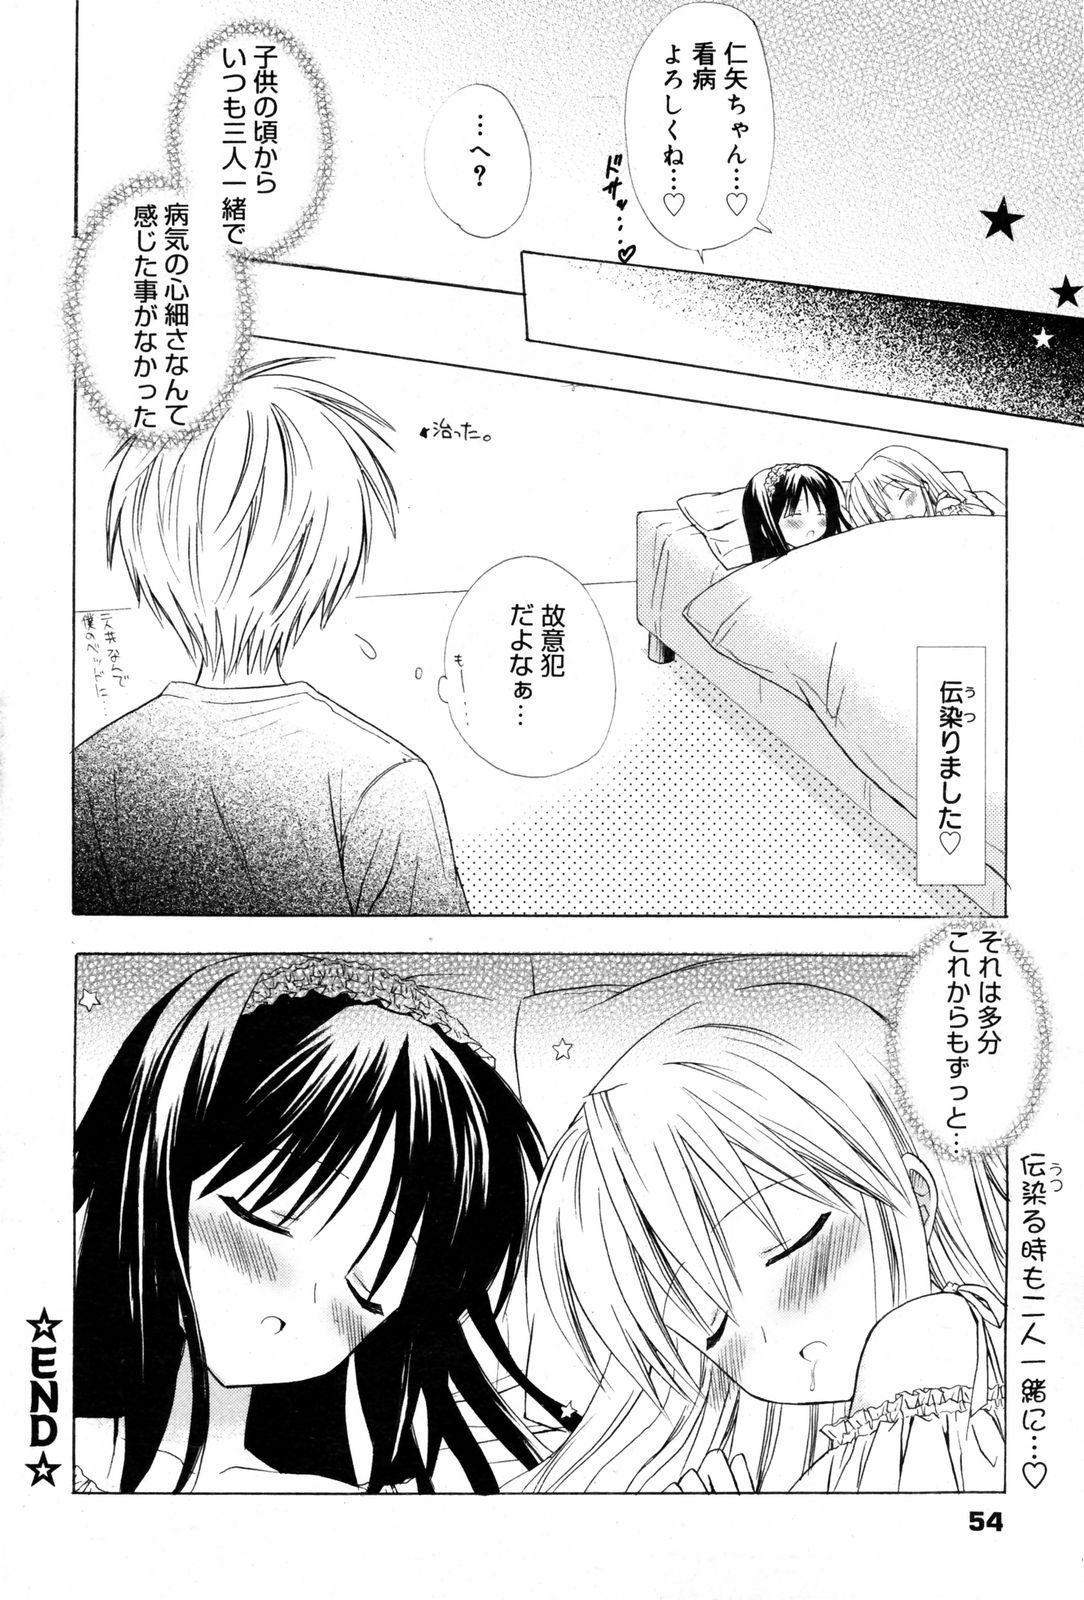 Manga Bangaichi 2008-03 53